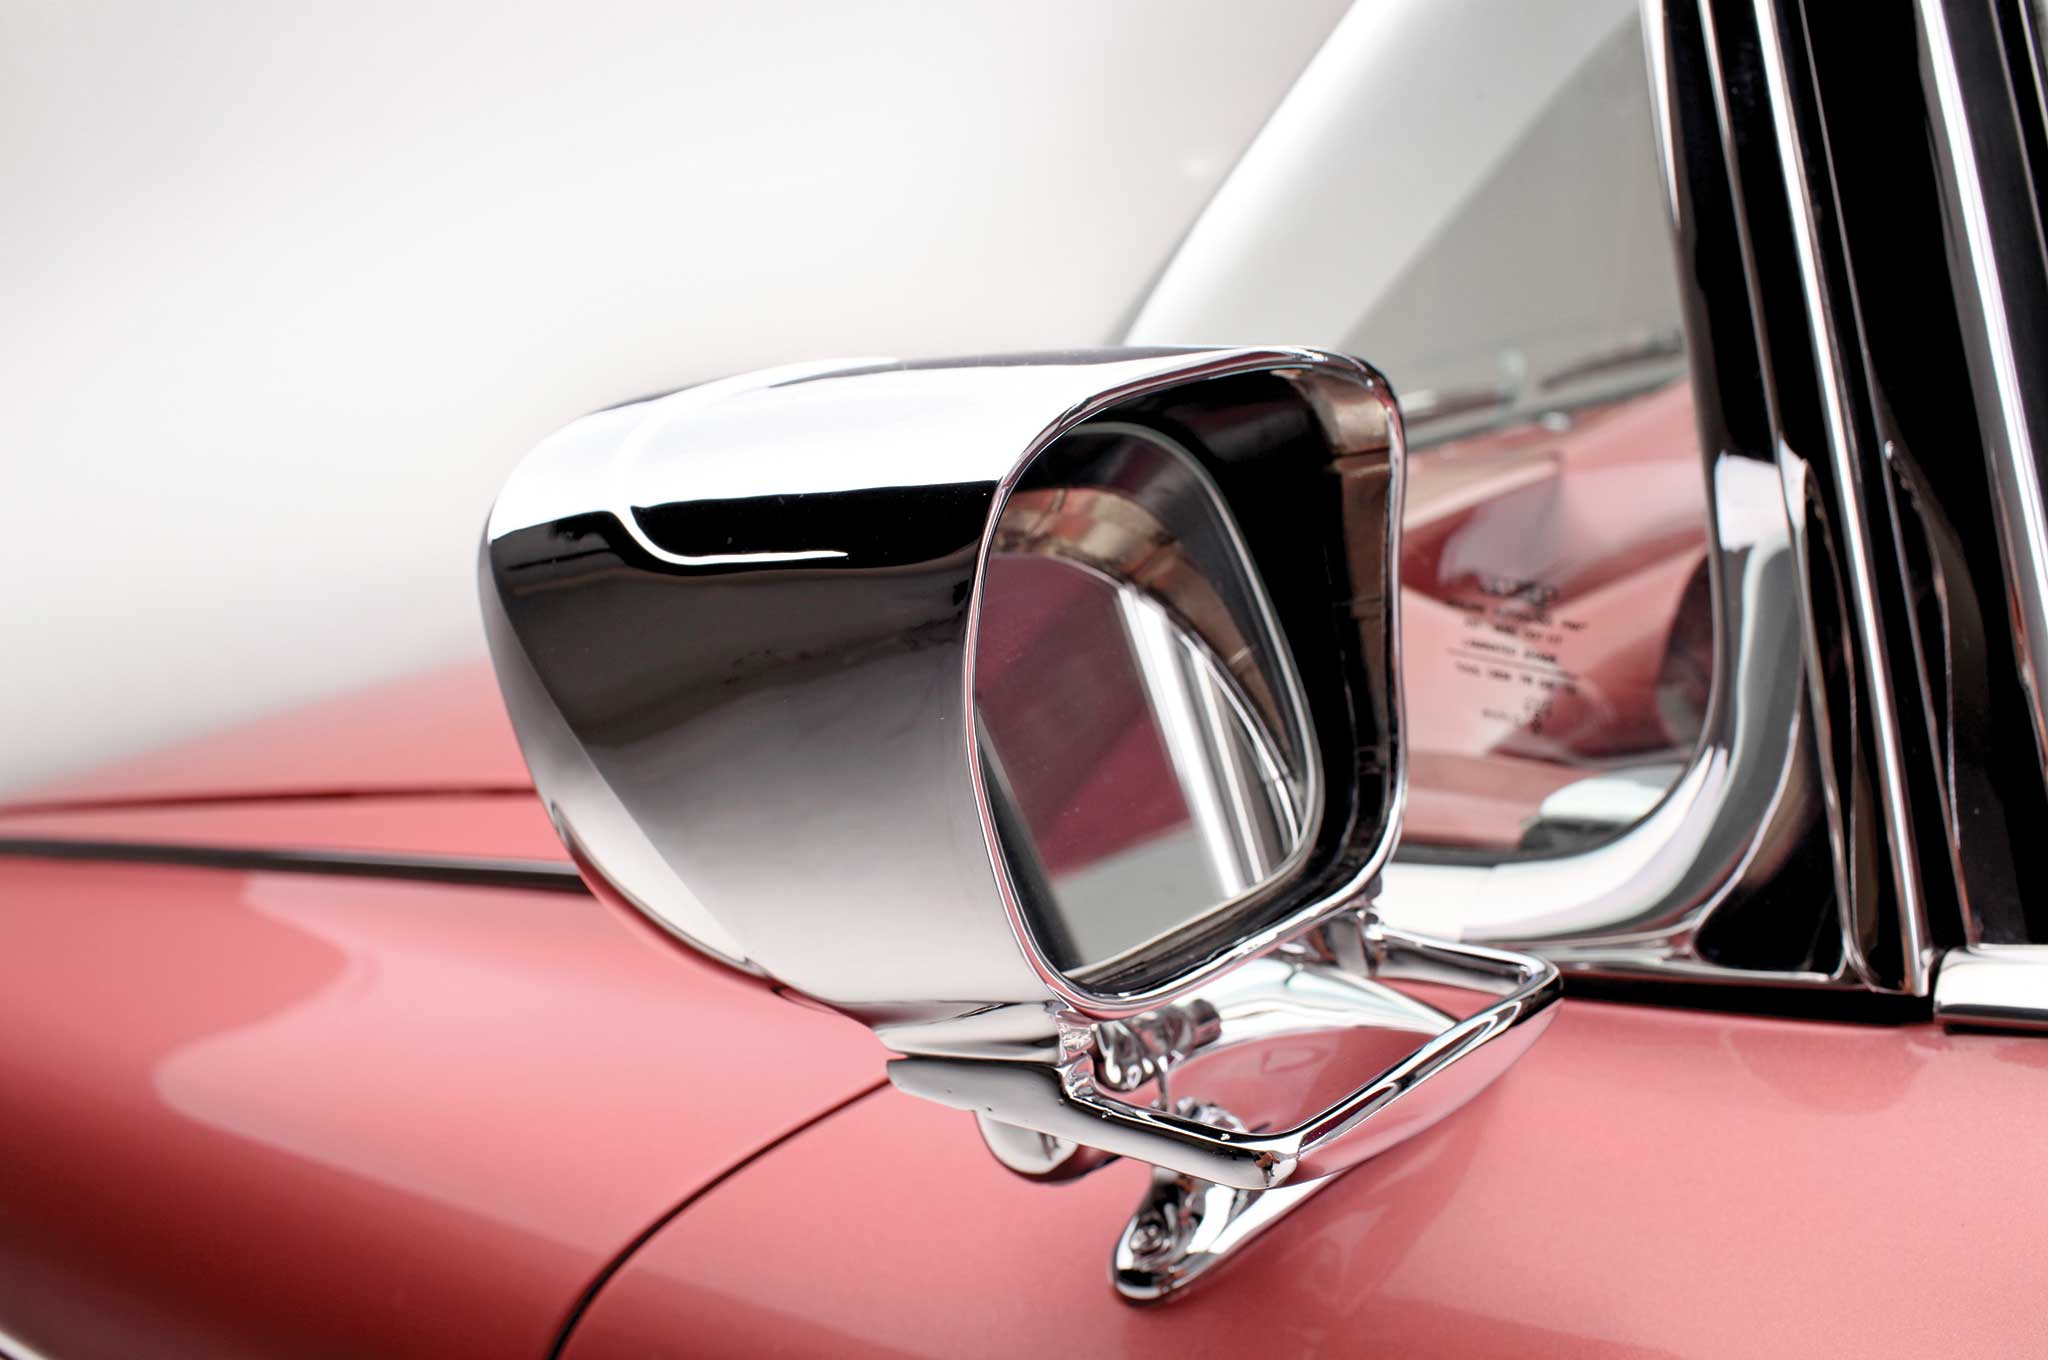 1959 Chevrolet Impala Pinky S 59 Lowrider